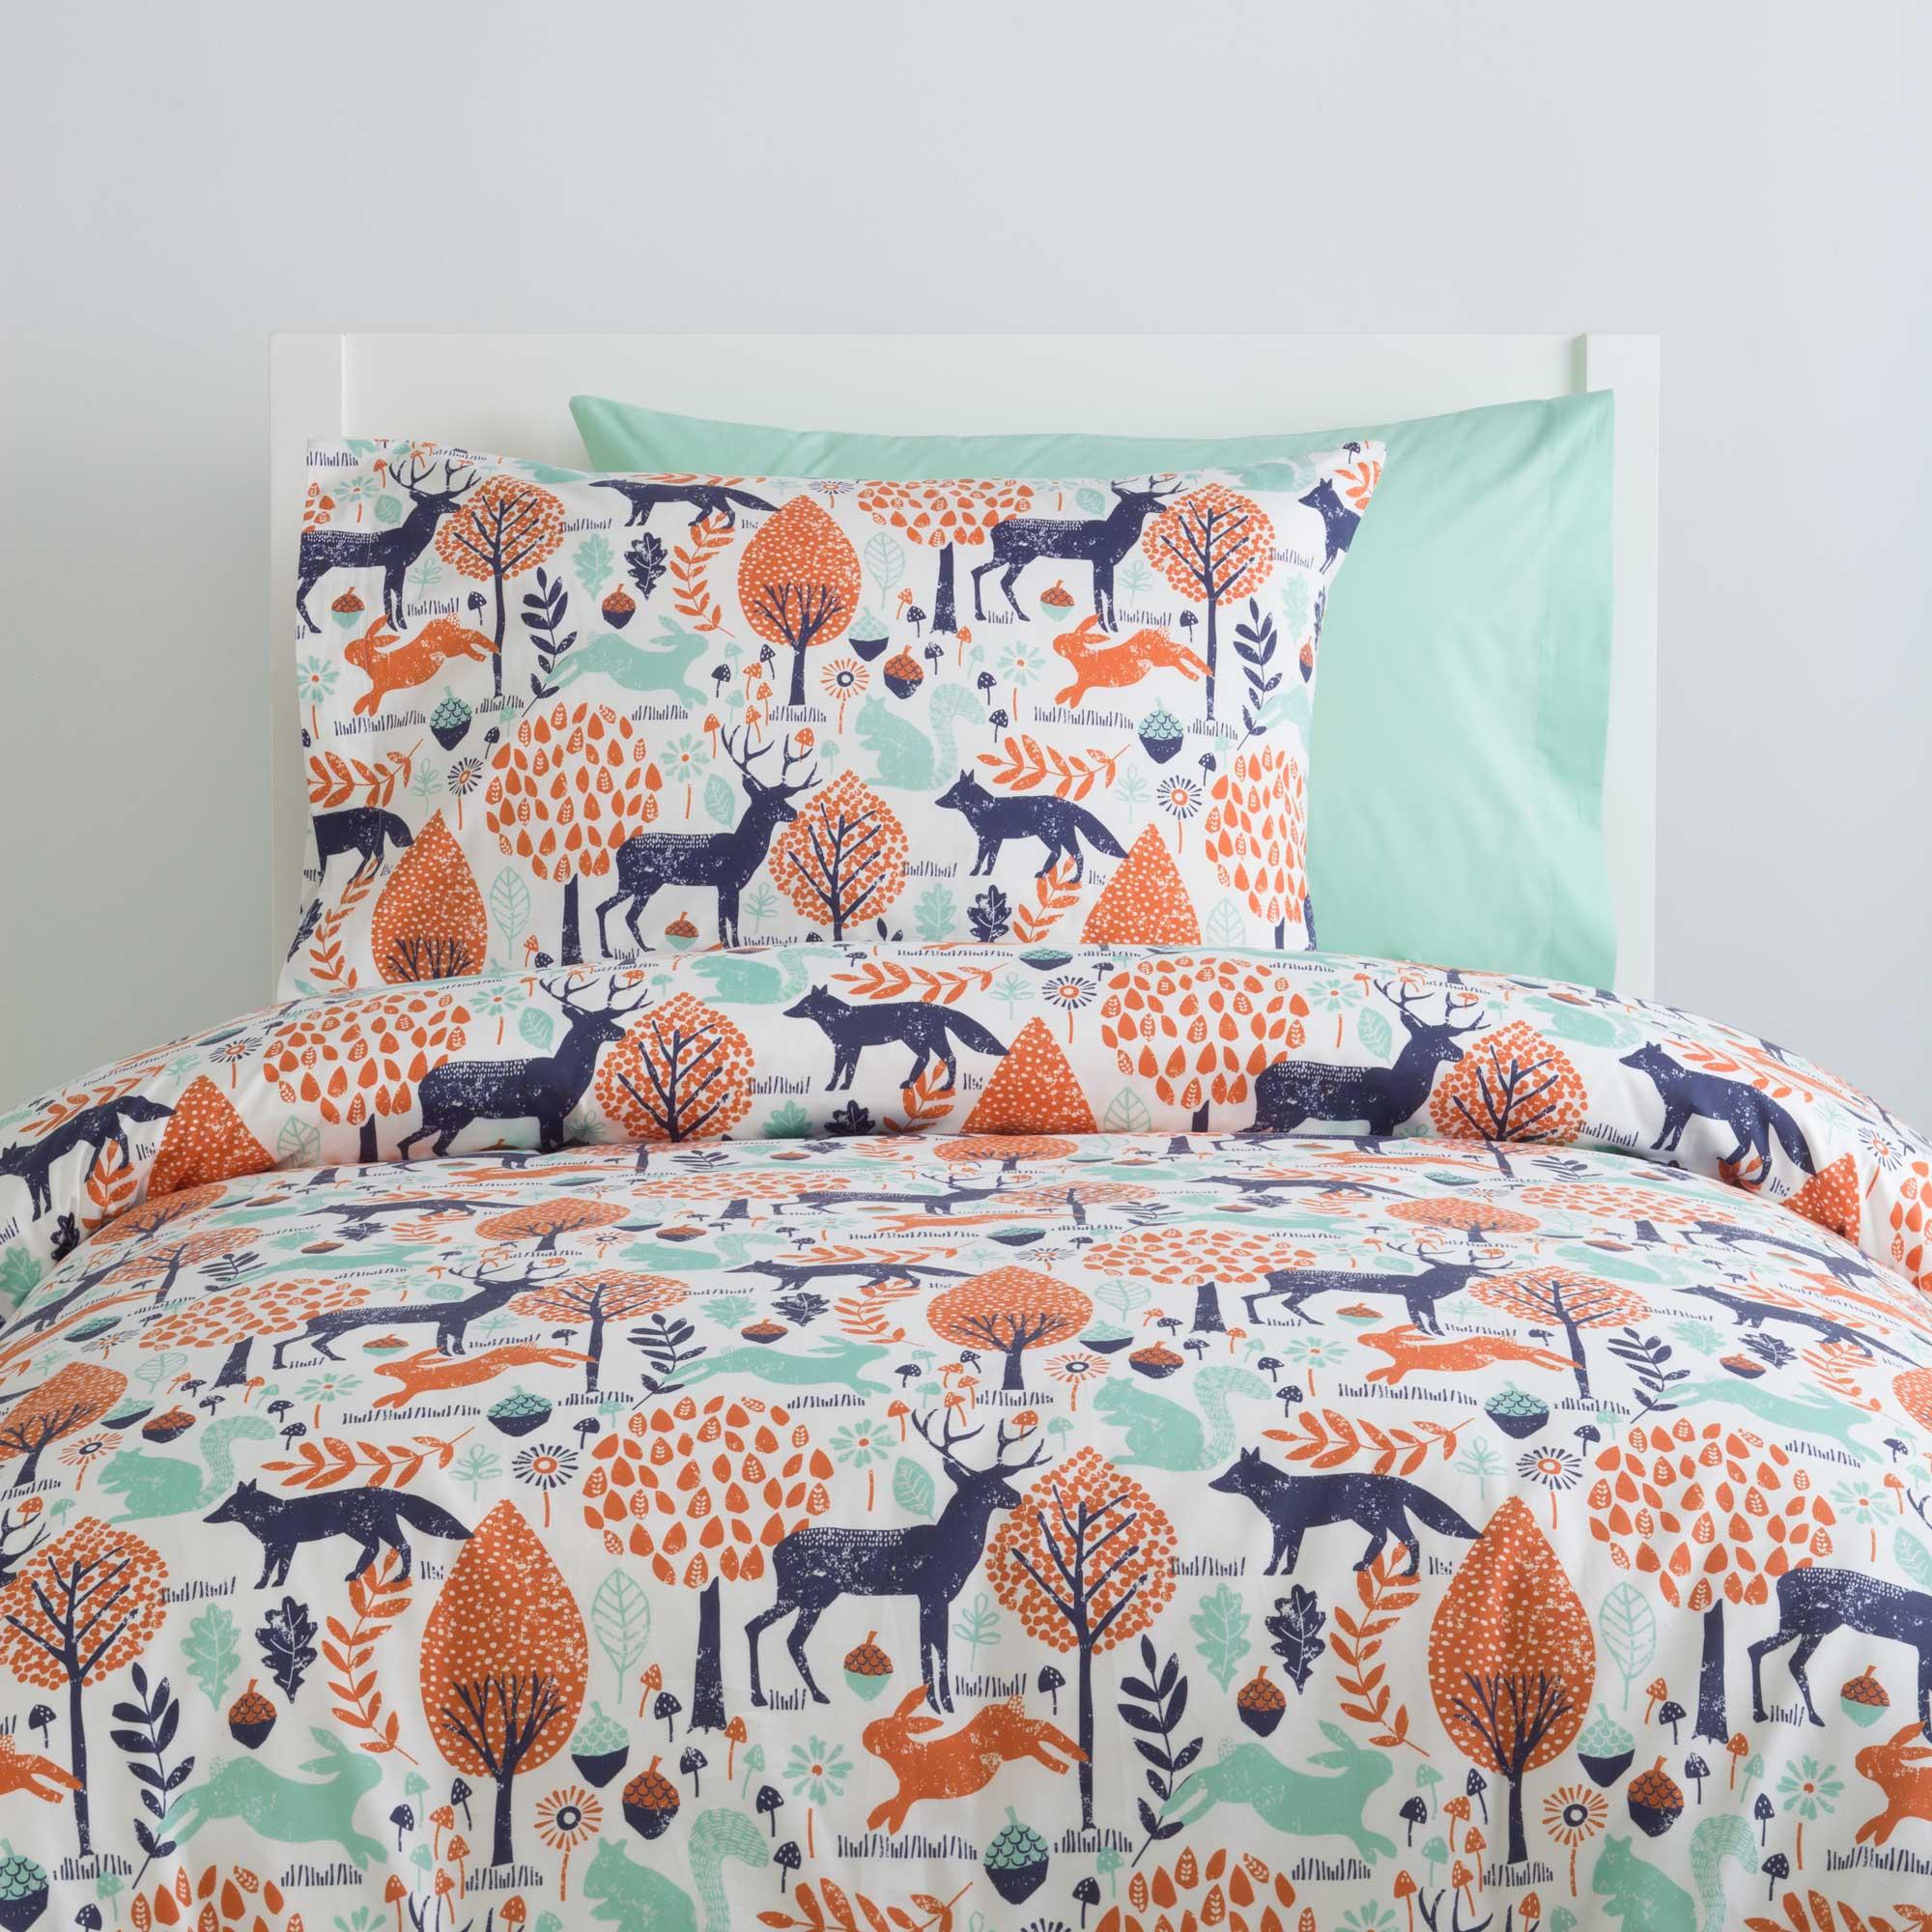 Woodland children's bed linen in navy and orange WJZGKHB